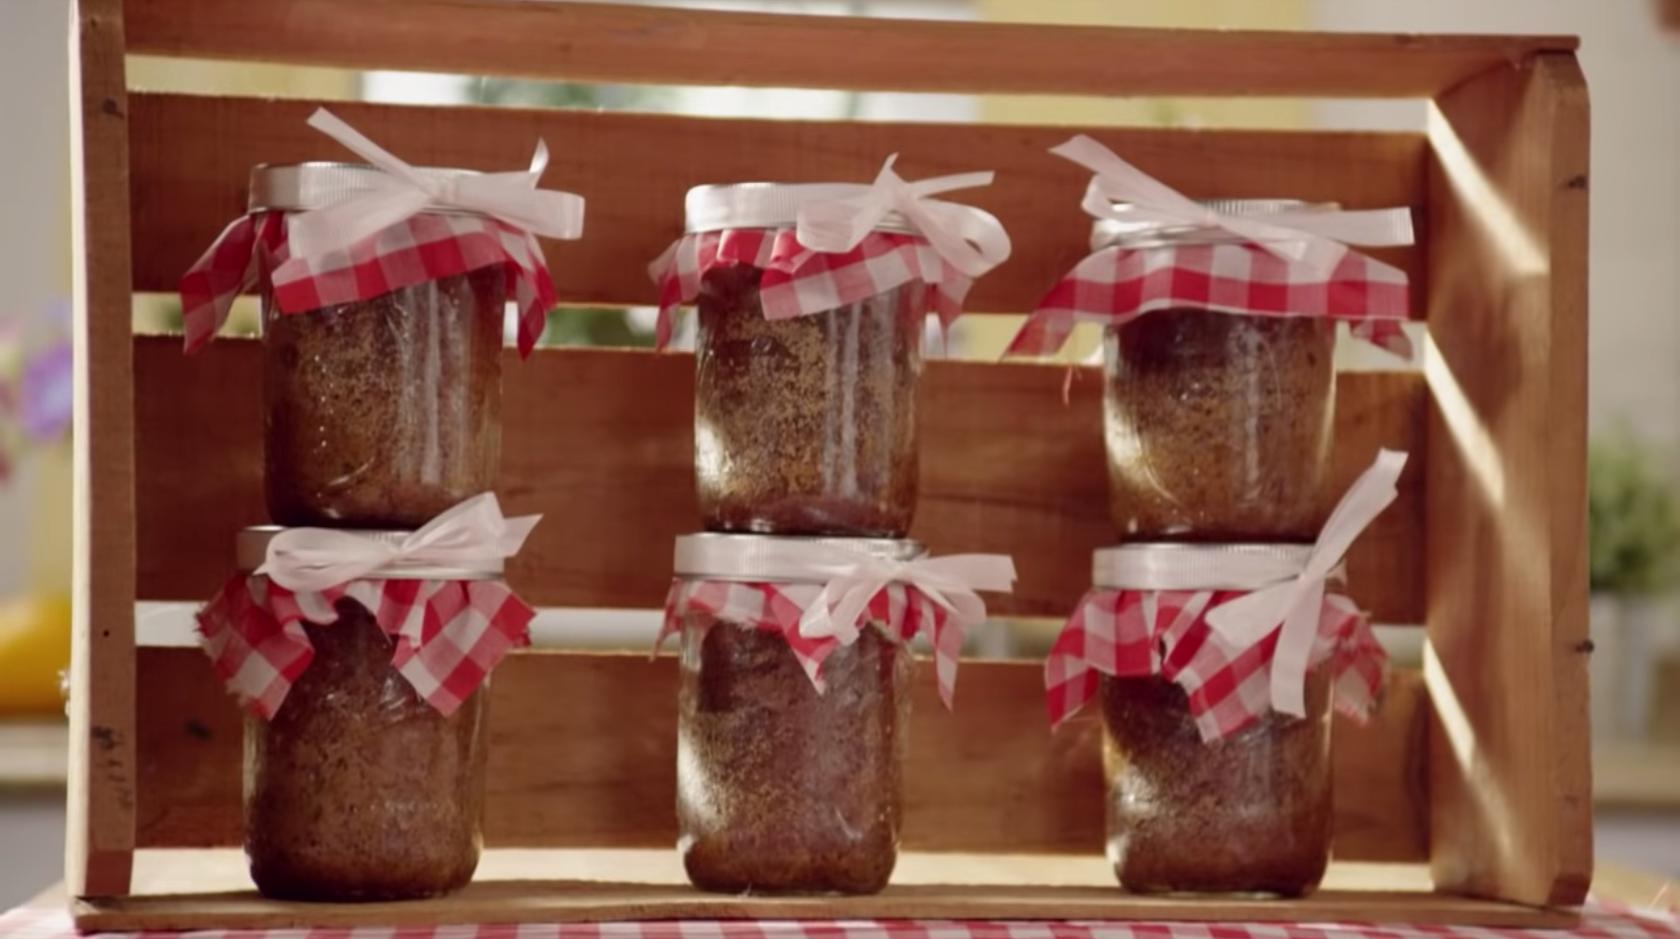 Banana Bread Recipe Is Baked In A Mason Jar Diy Ways